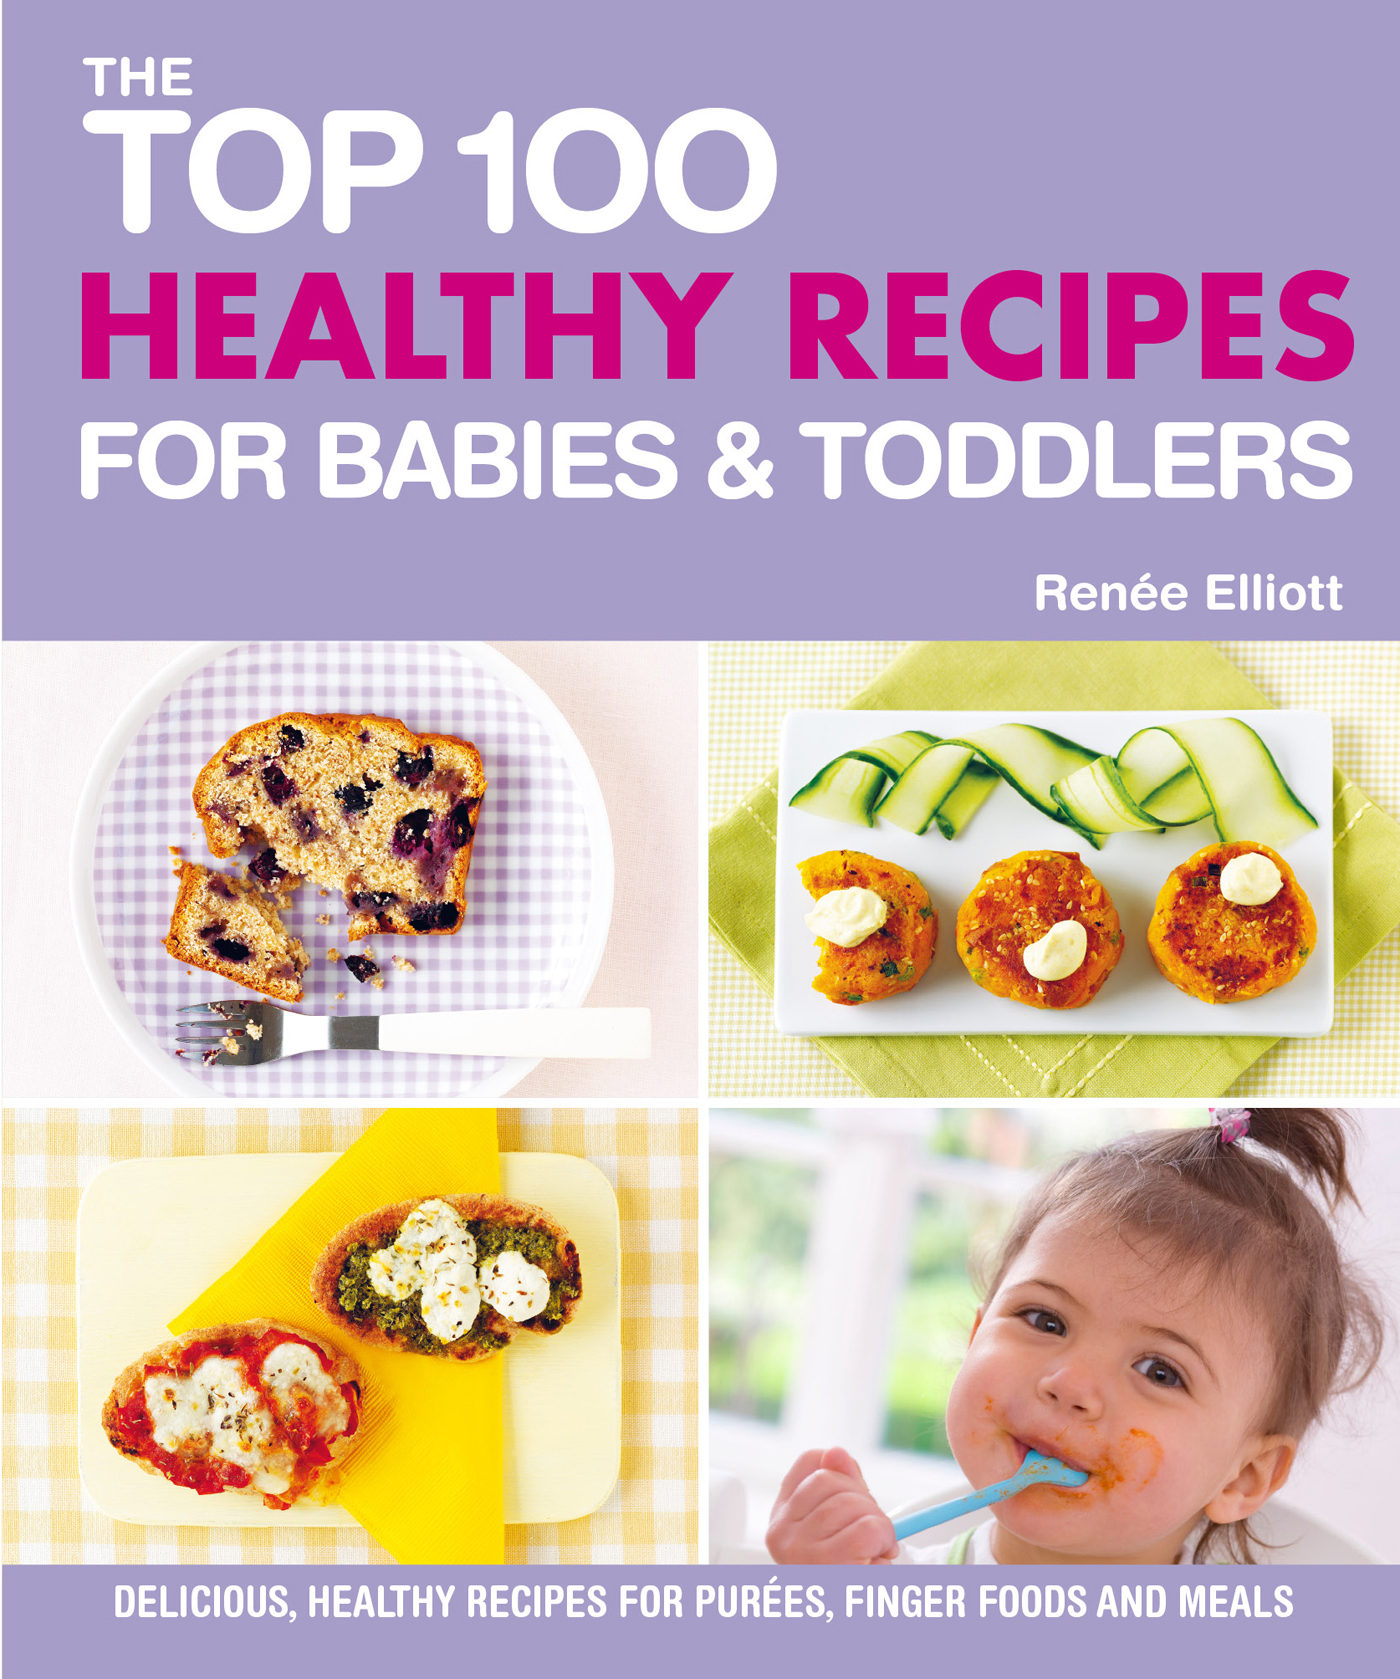 Top 100 healthy recipes for babies and toddlers ebook renee top 100 healthy recipes for babies and toddlers ebook renee elliott 9781848991378 forumfinder Gallery